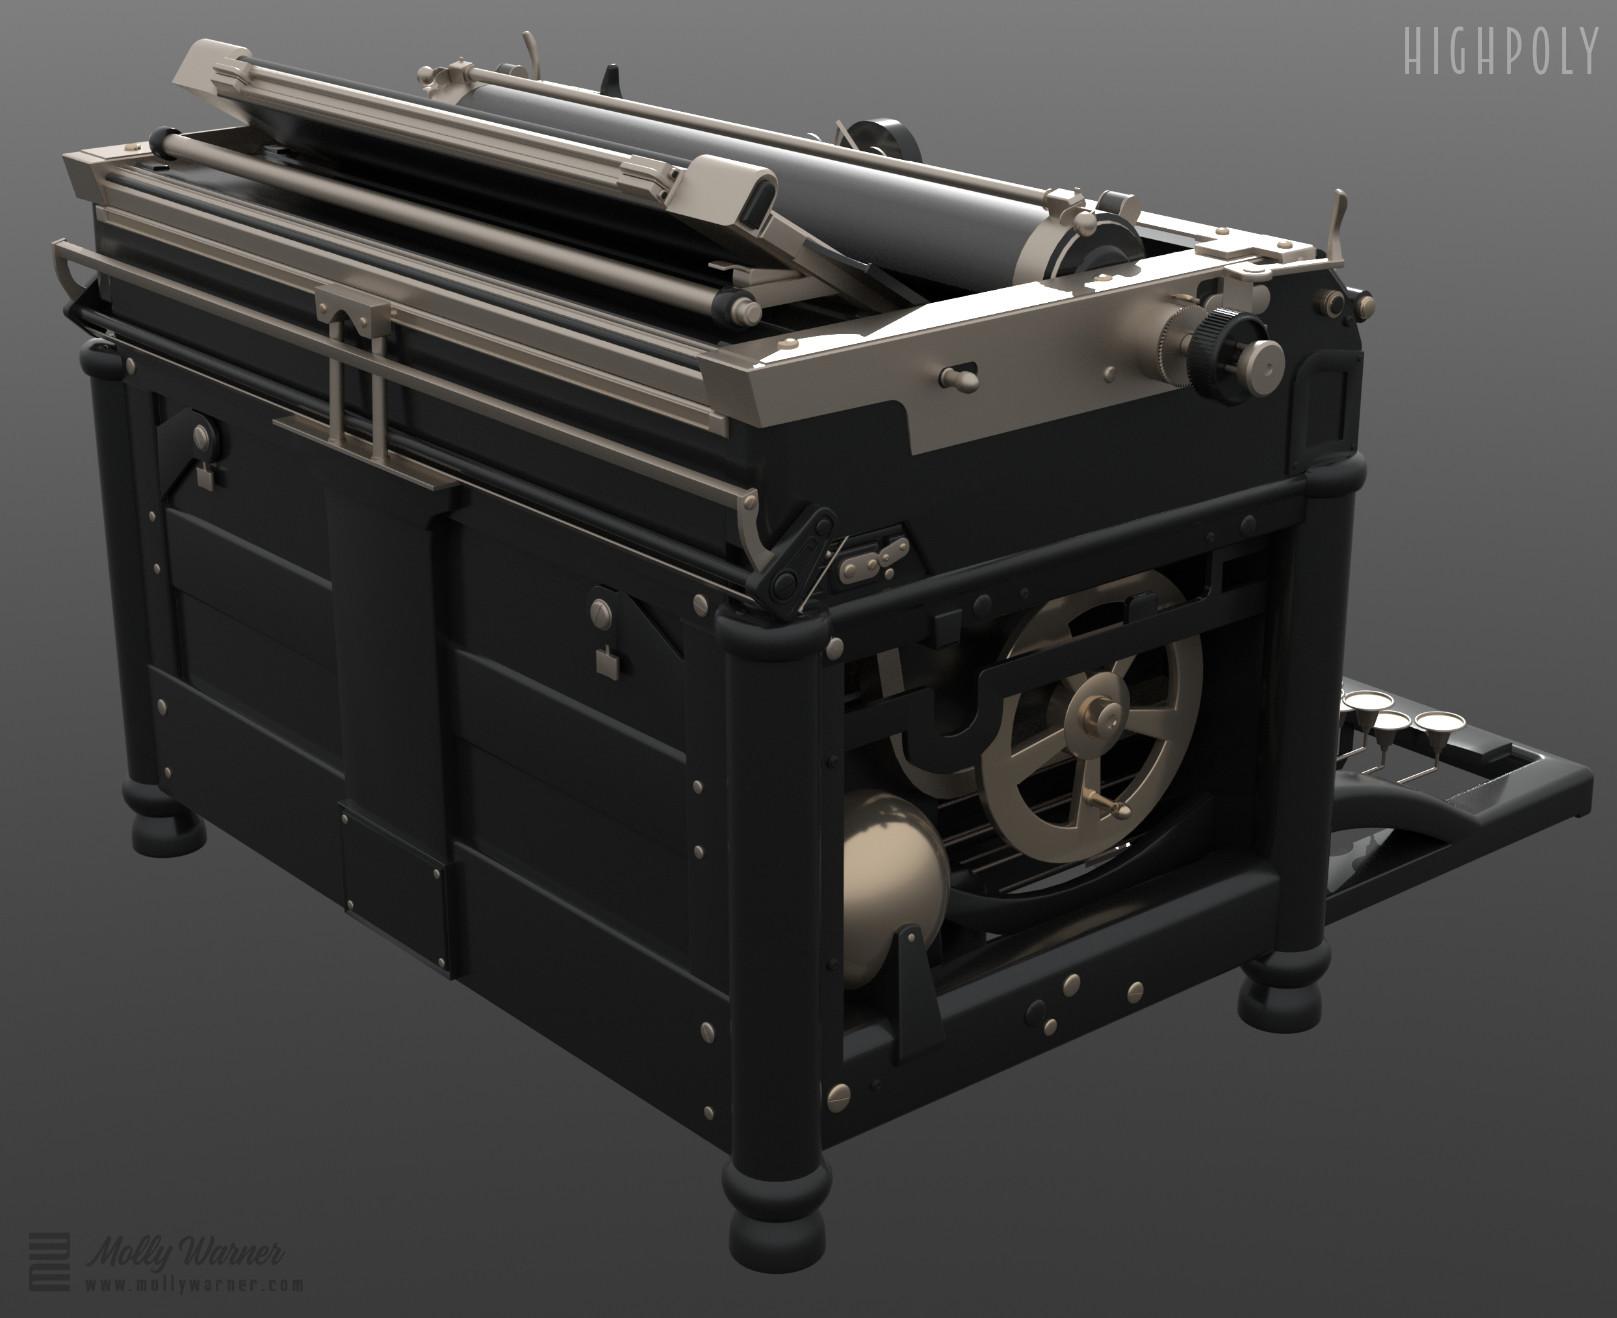 Molly warner mwarner typewriter final3